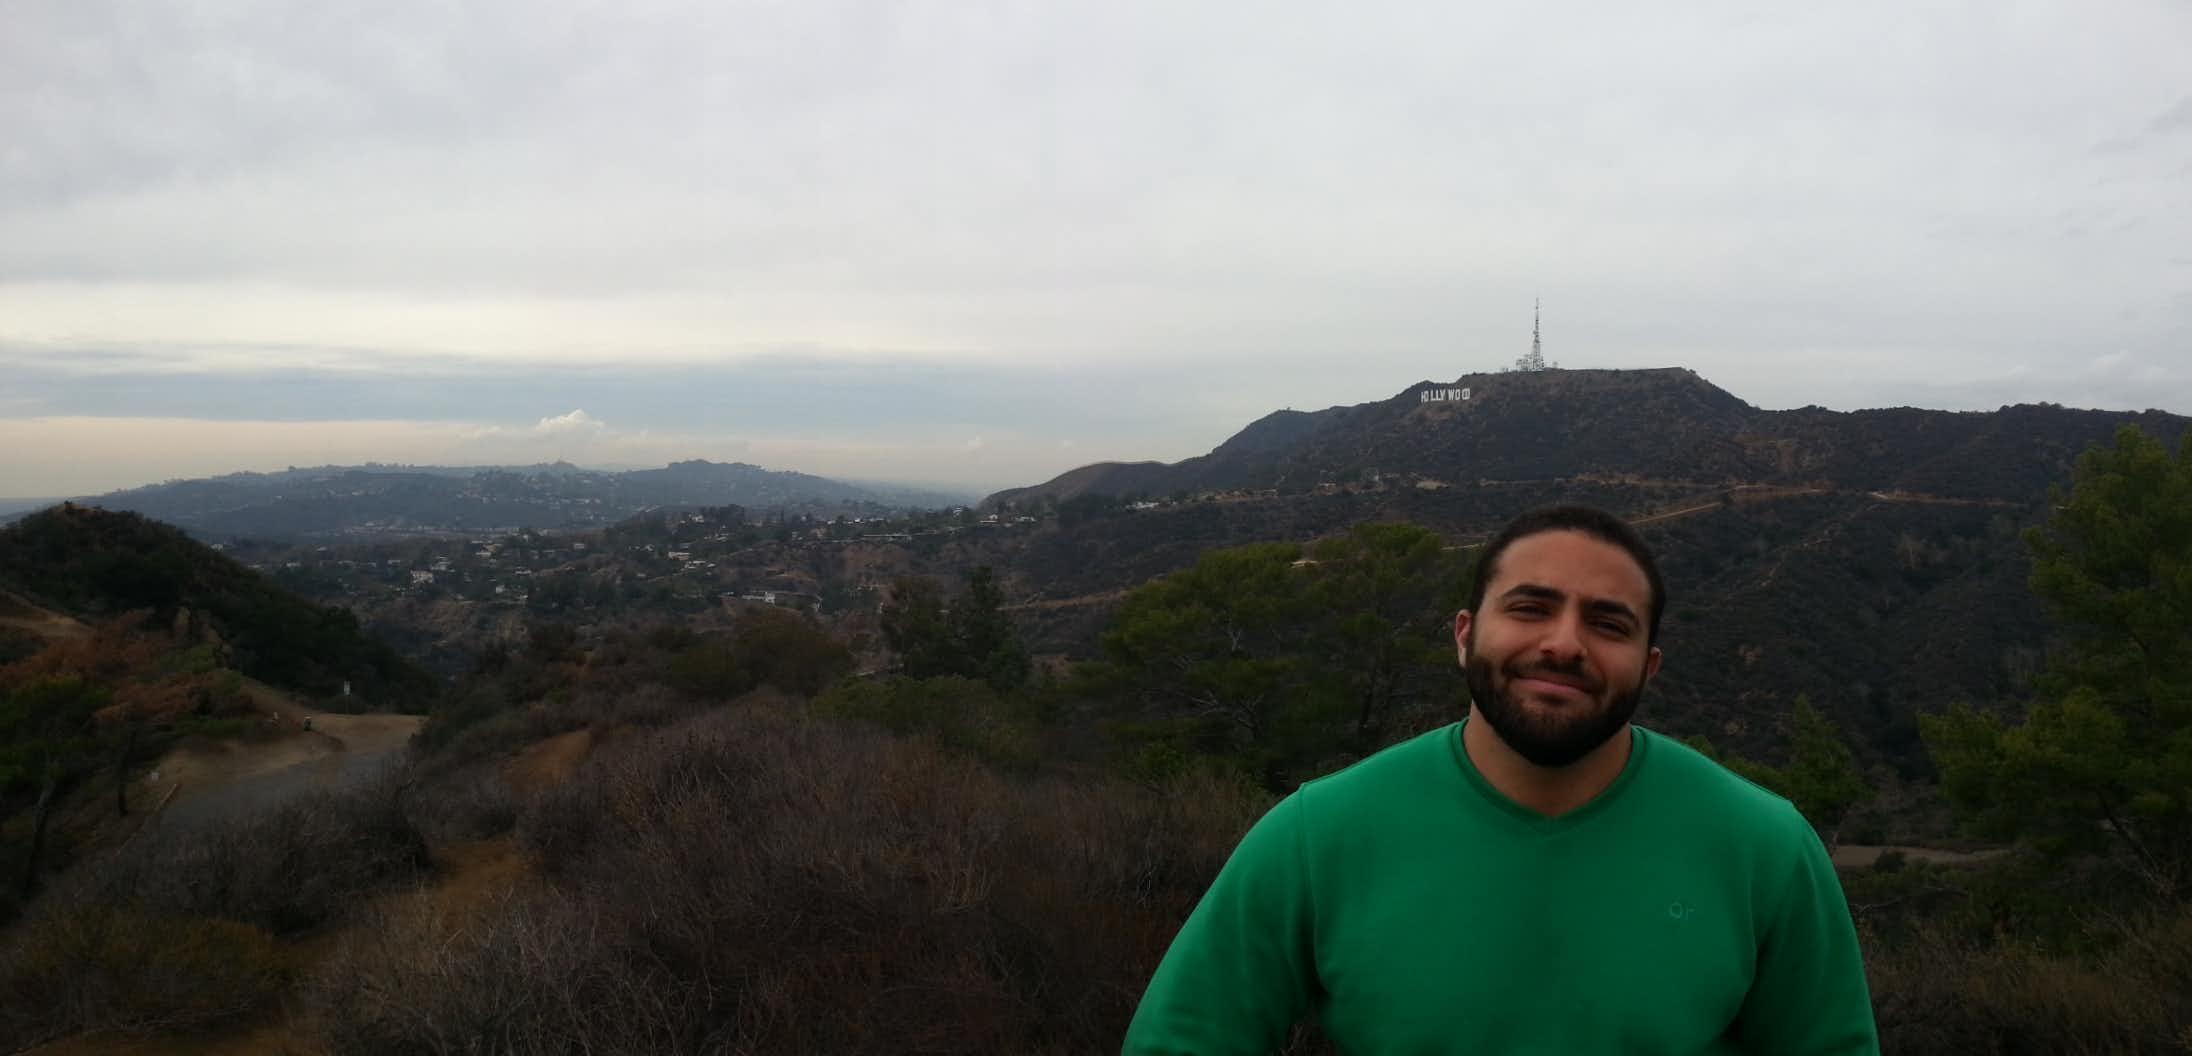 Mostafa during his time in California